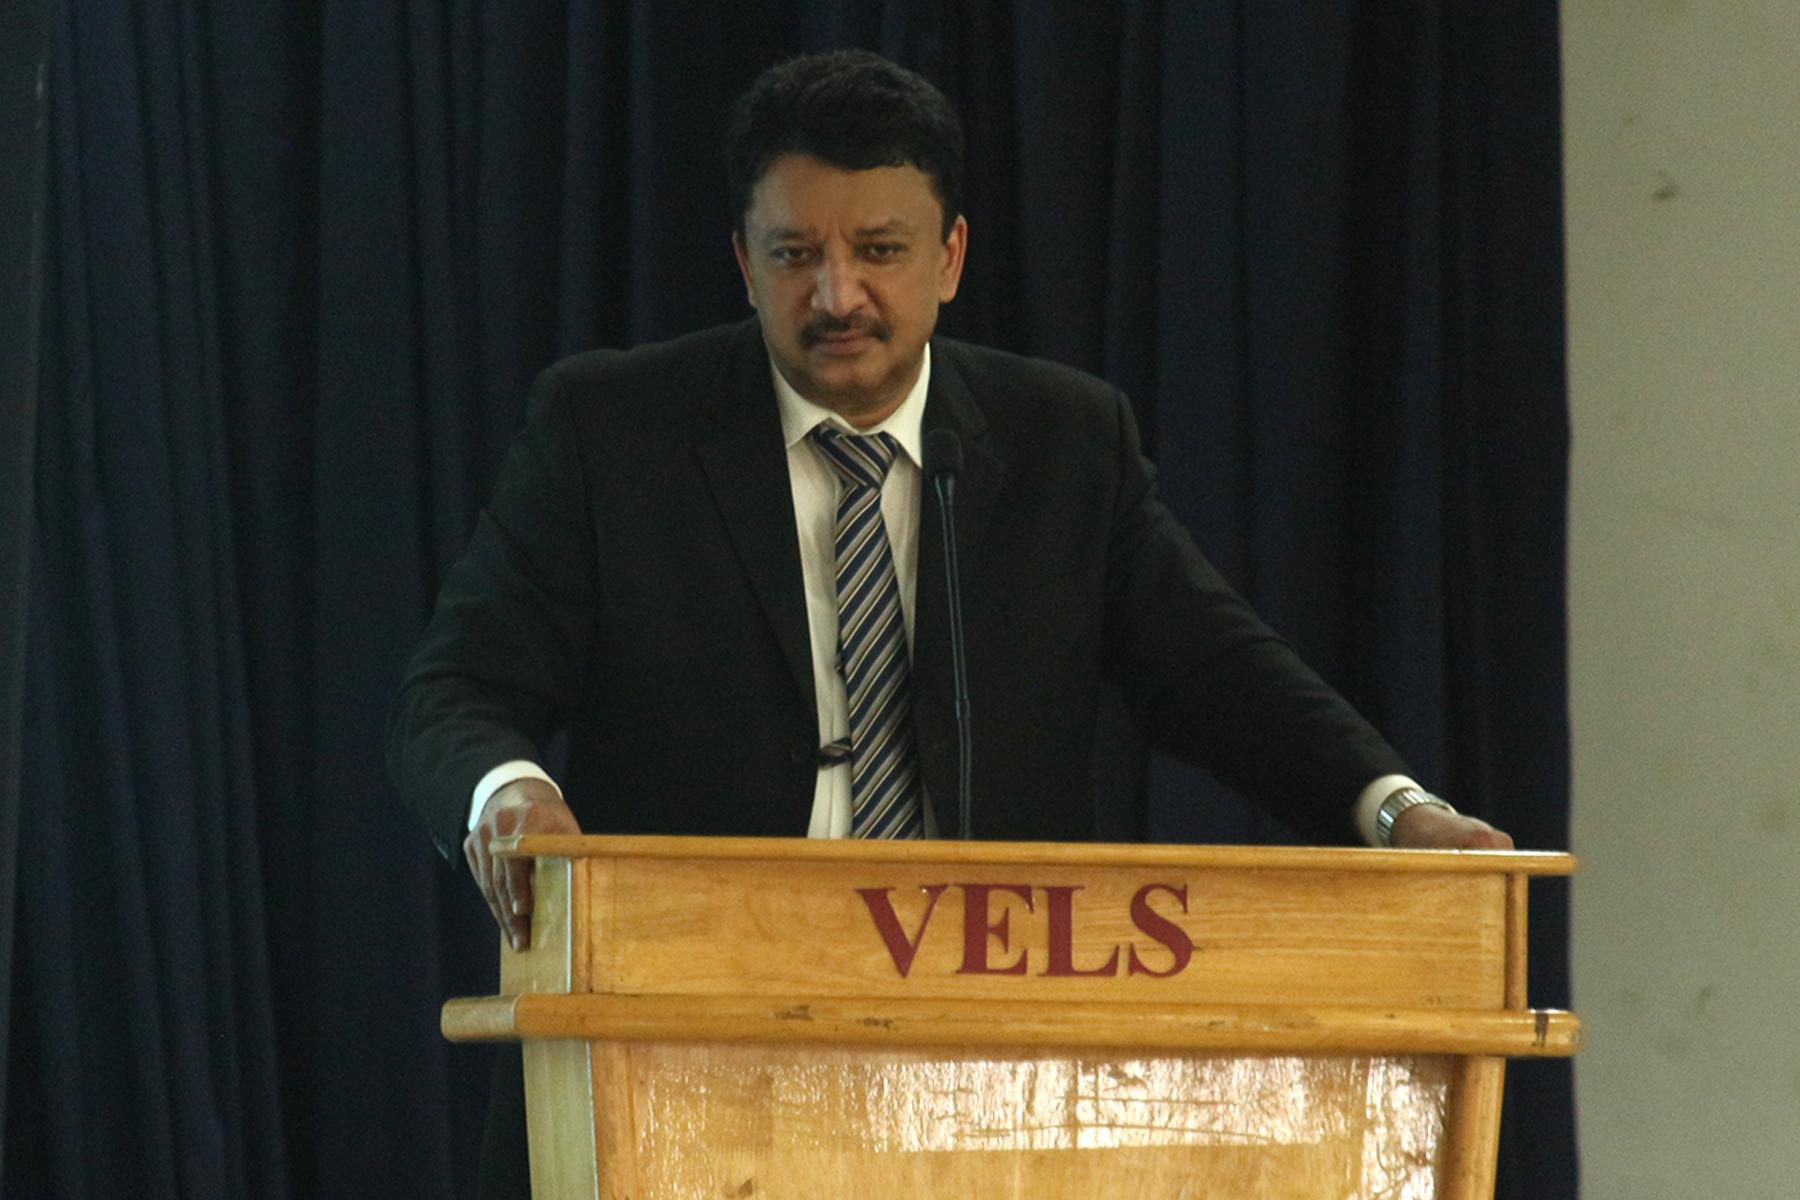 Dr Sm Balaji At His Speech Introducing Craniofacial Surgery To The Students